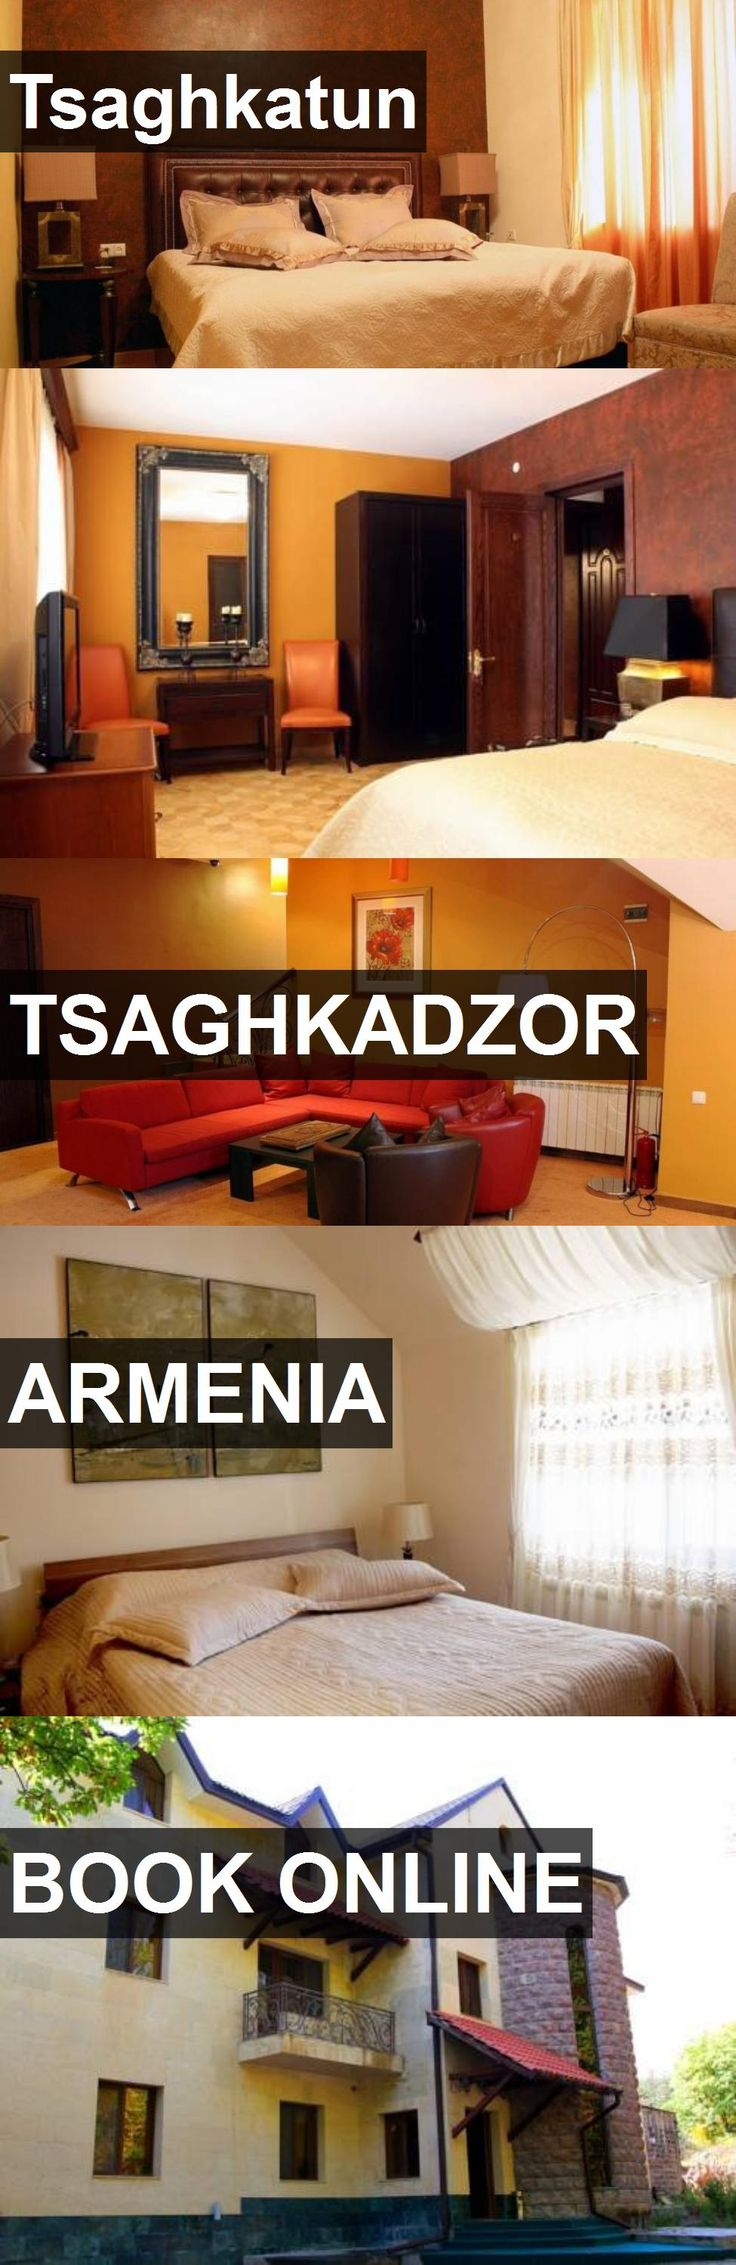 Hotel Tsaghkatun in Tsaghkadzor, Armenia. For more information, photos, reviews and best prices please follow the link. #Armenia #Tsaghkadzor #travel #vacation #hotel